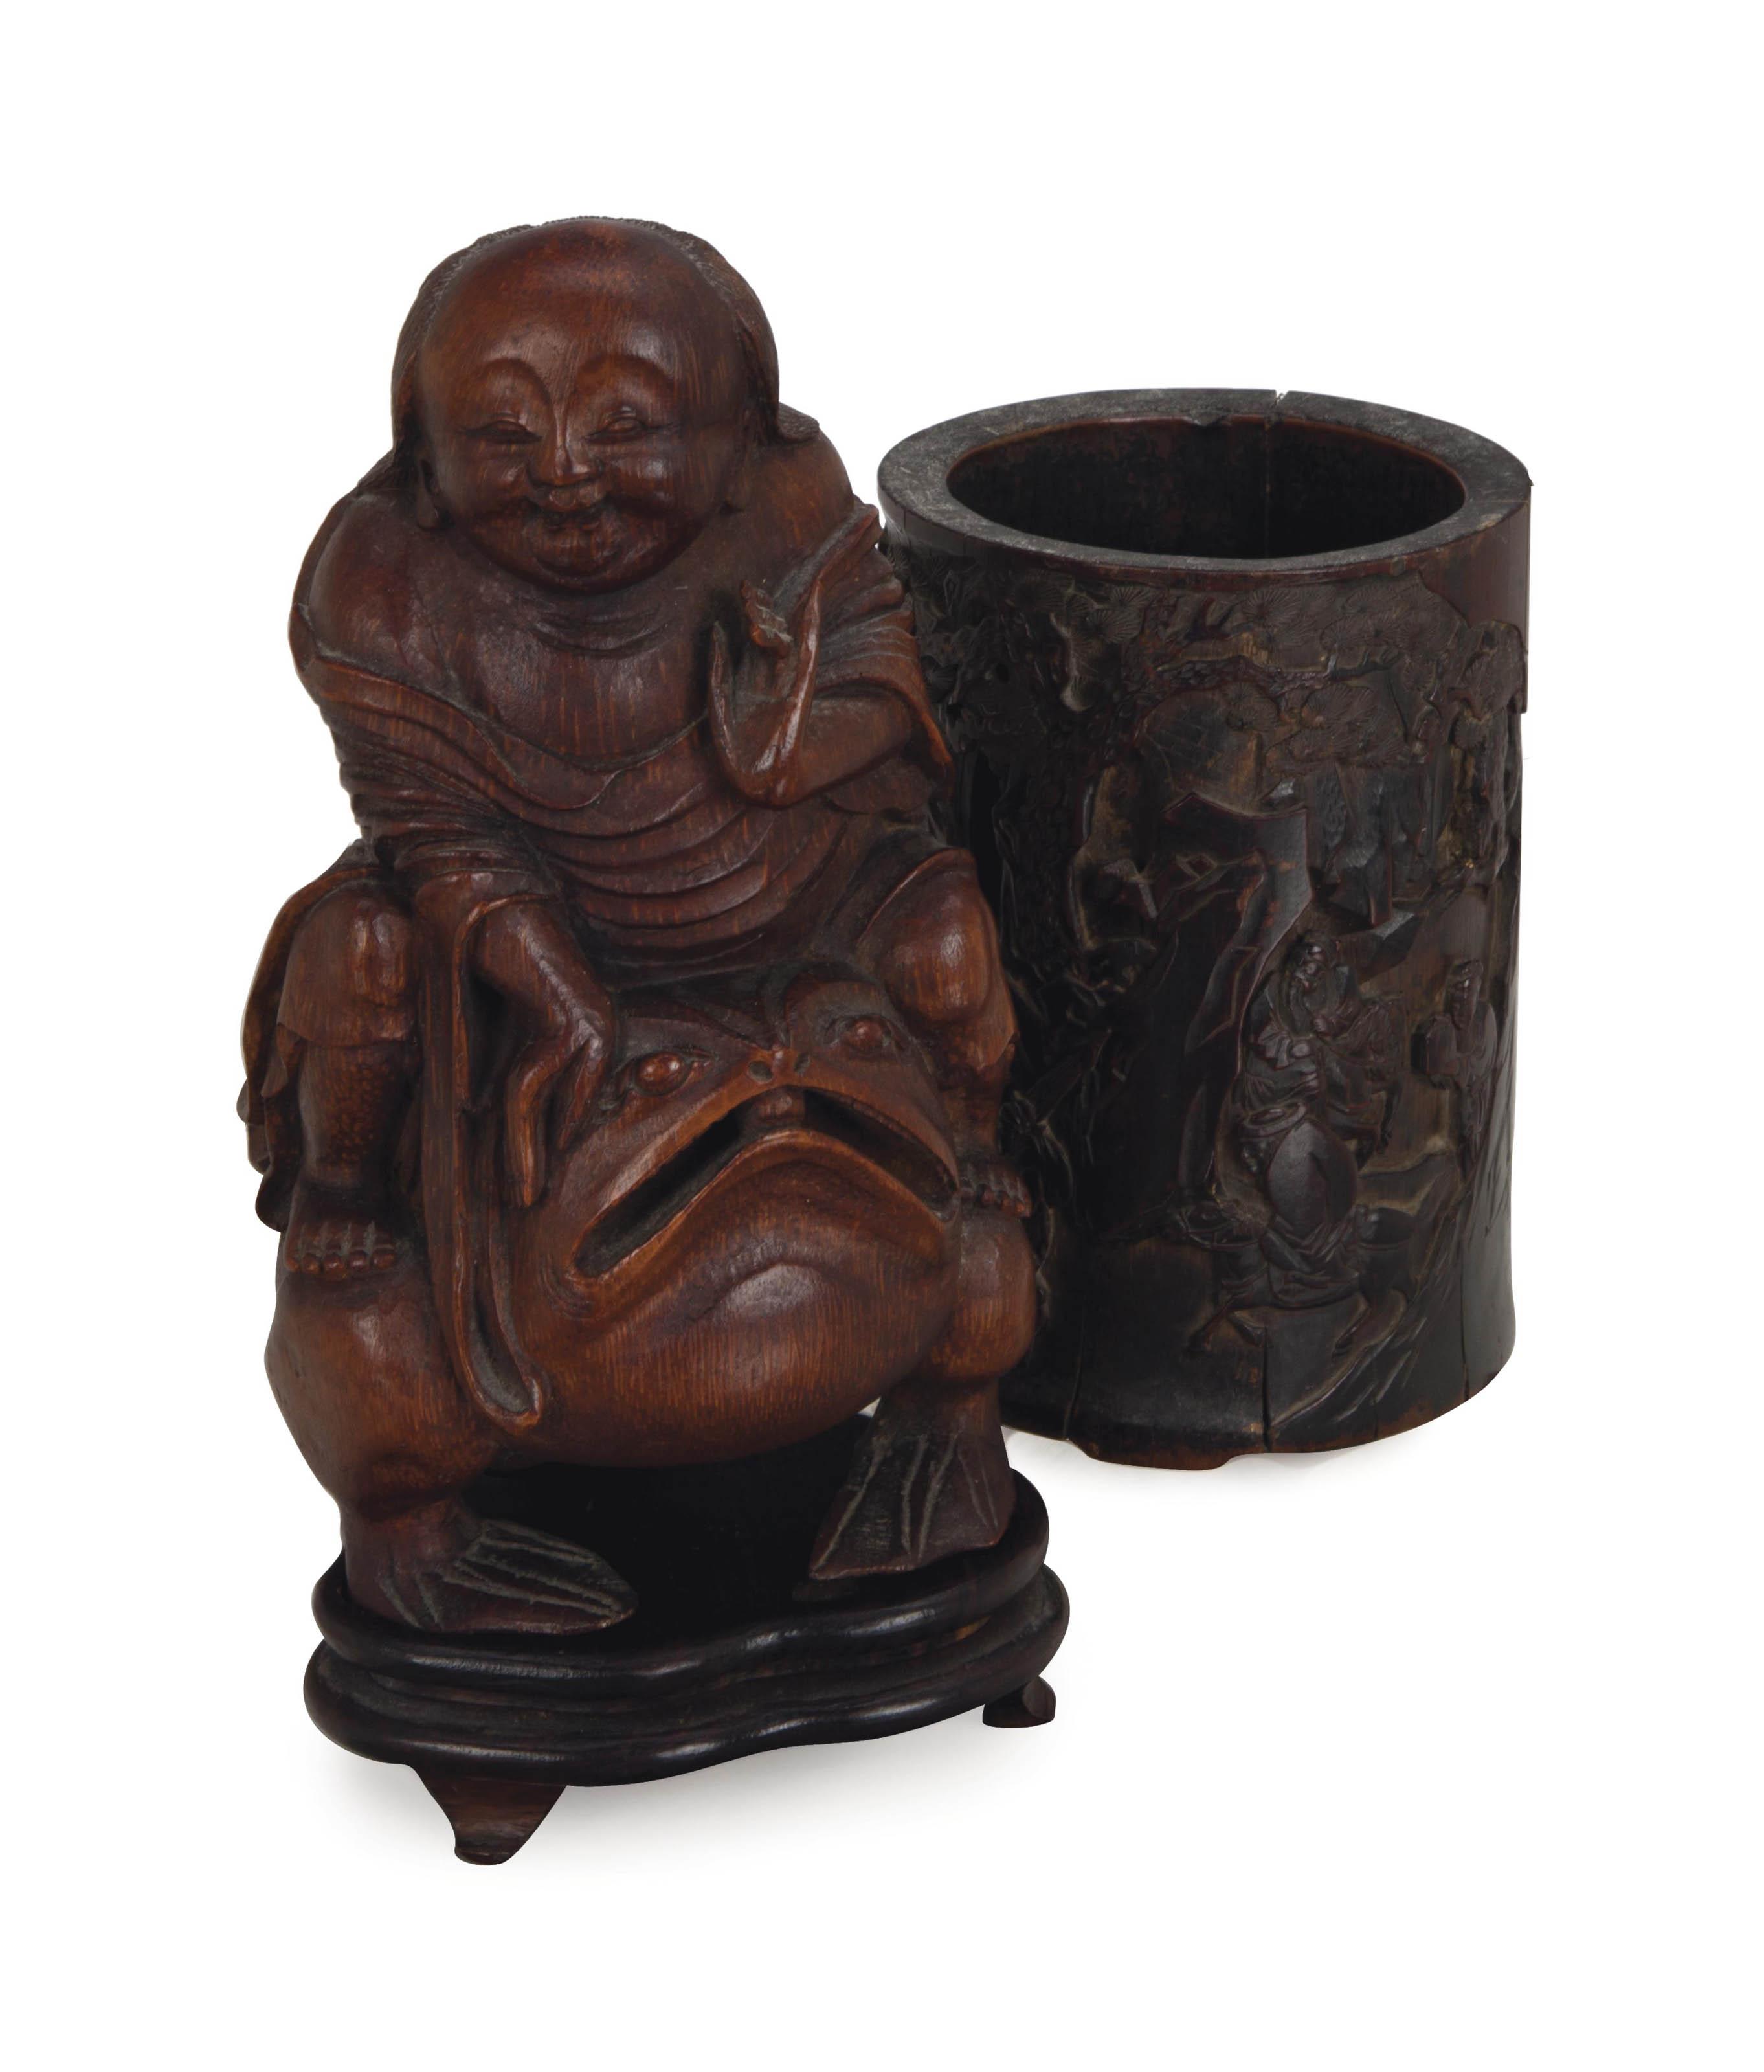 A CHINESE HARDWOOD BRUSH POT, AND A BAMBOO CARVING OF LIU HAI AND HIS THREE-LEGGED TOAD,